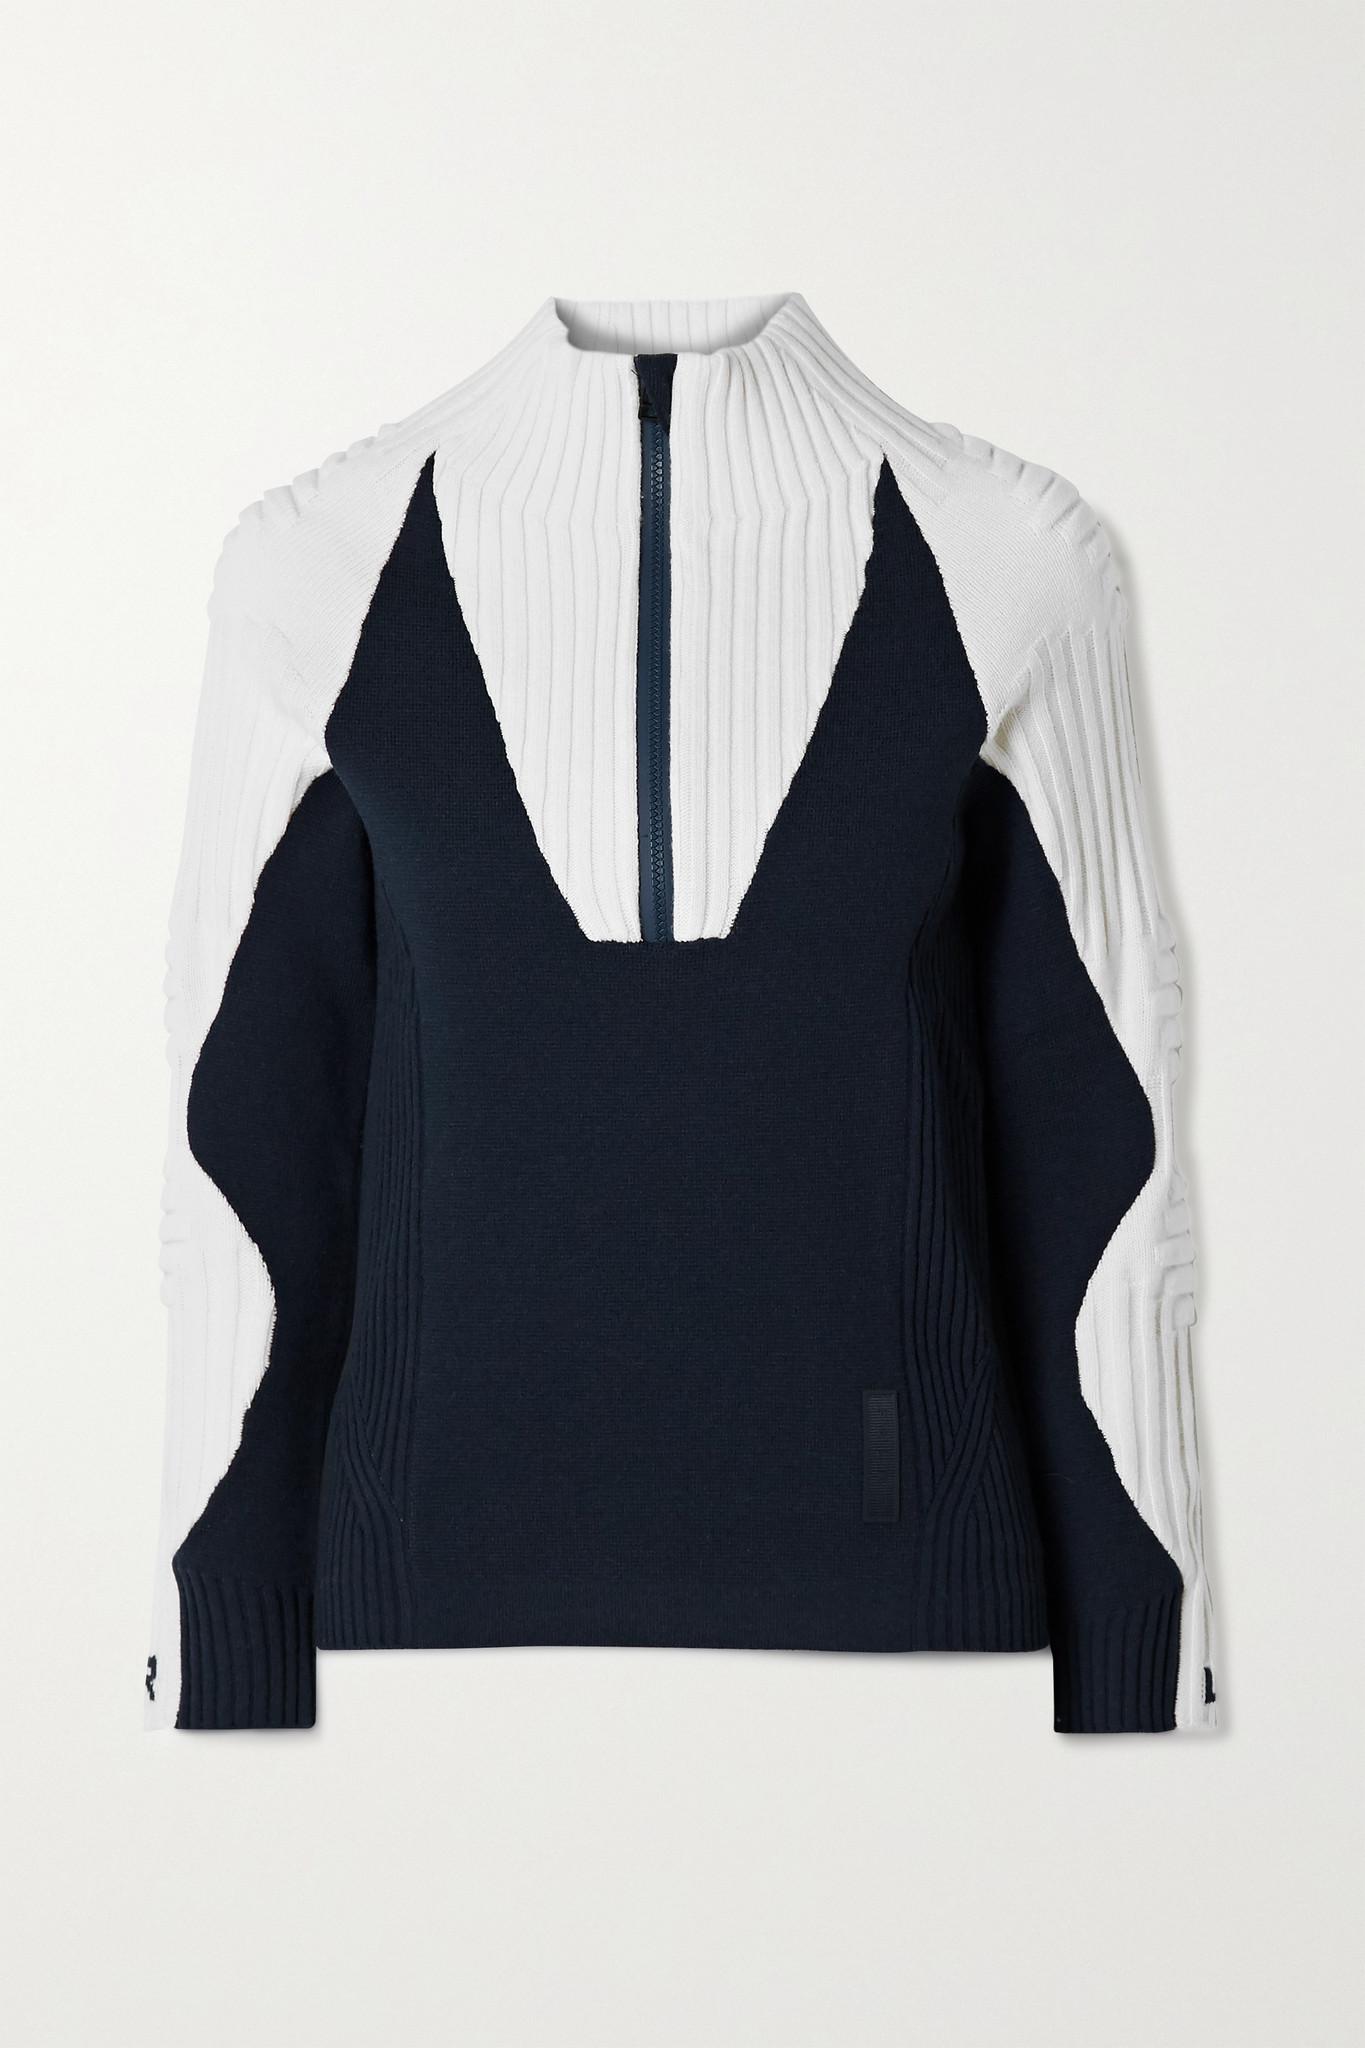 FALKE ERGONOMIC SPORT SYSTEM - Ribbed Wool-blend Sweater - Blue - small